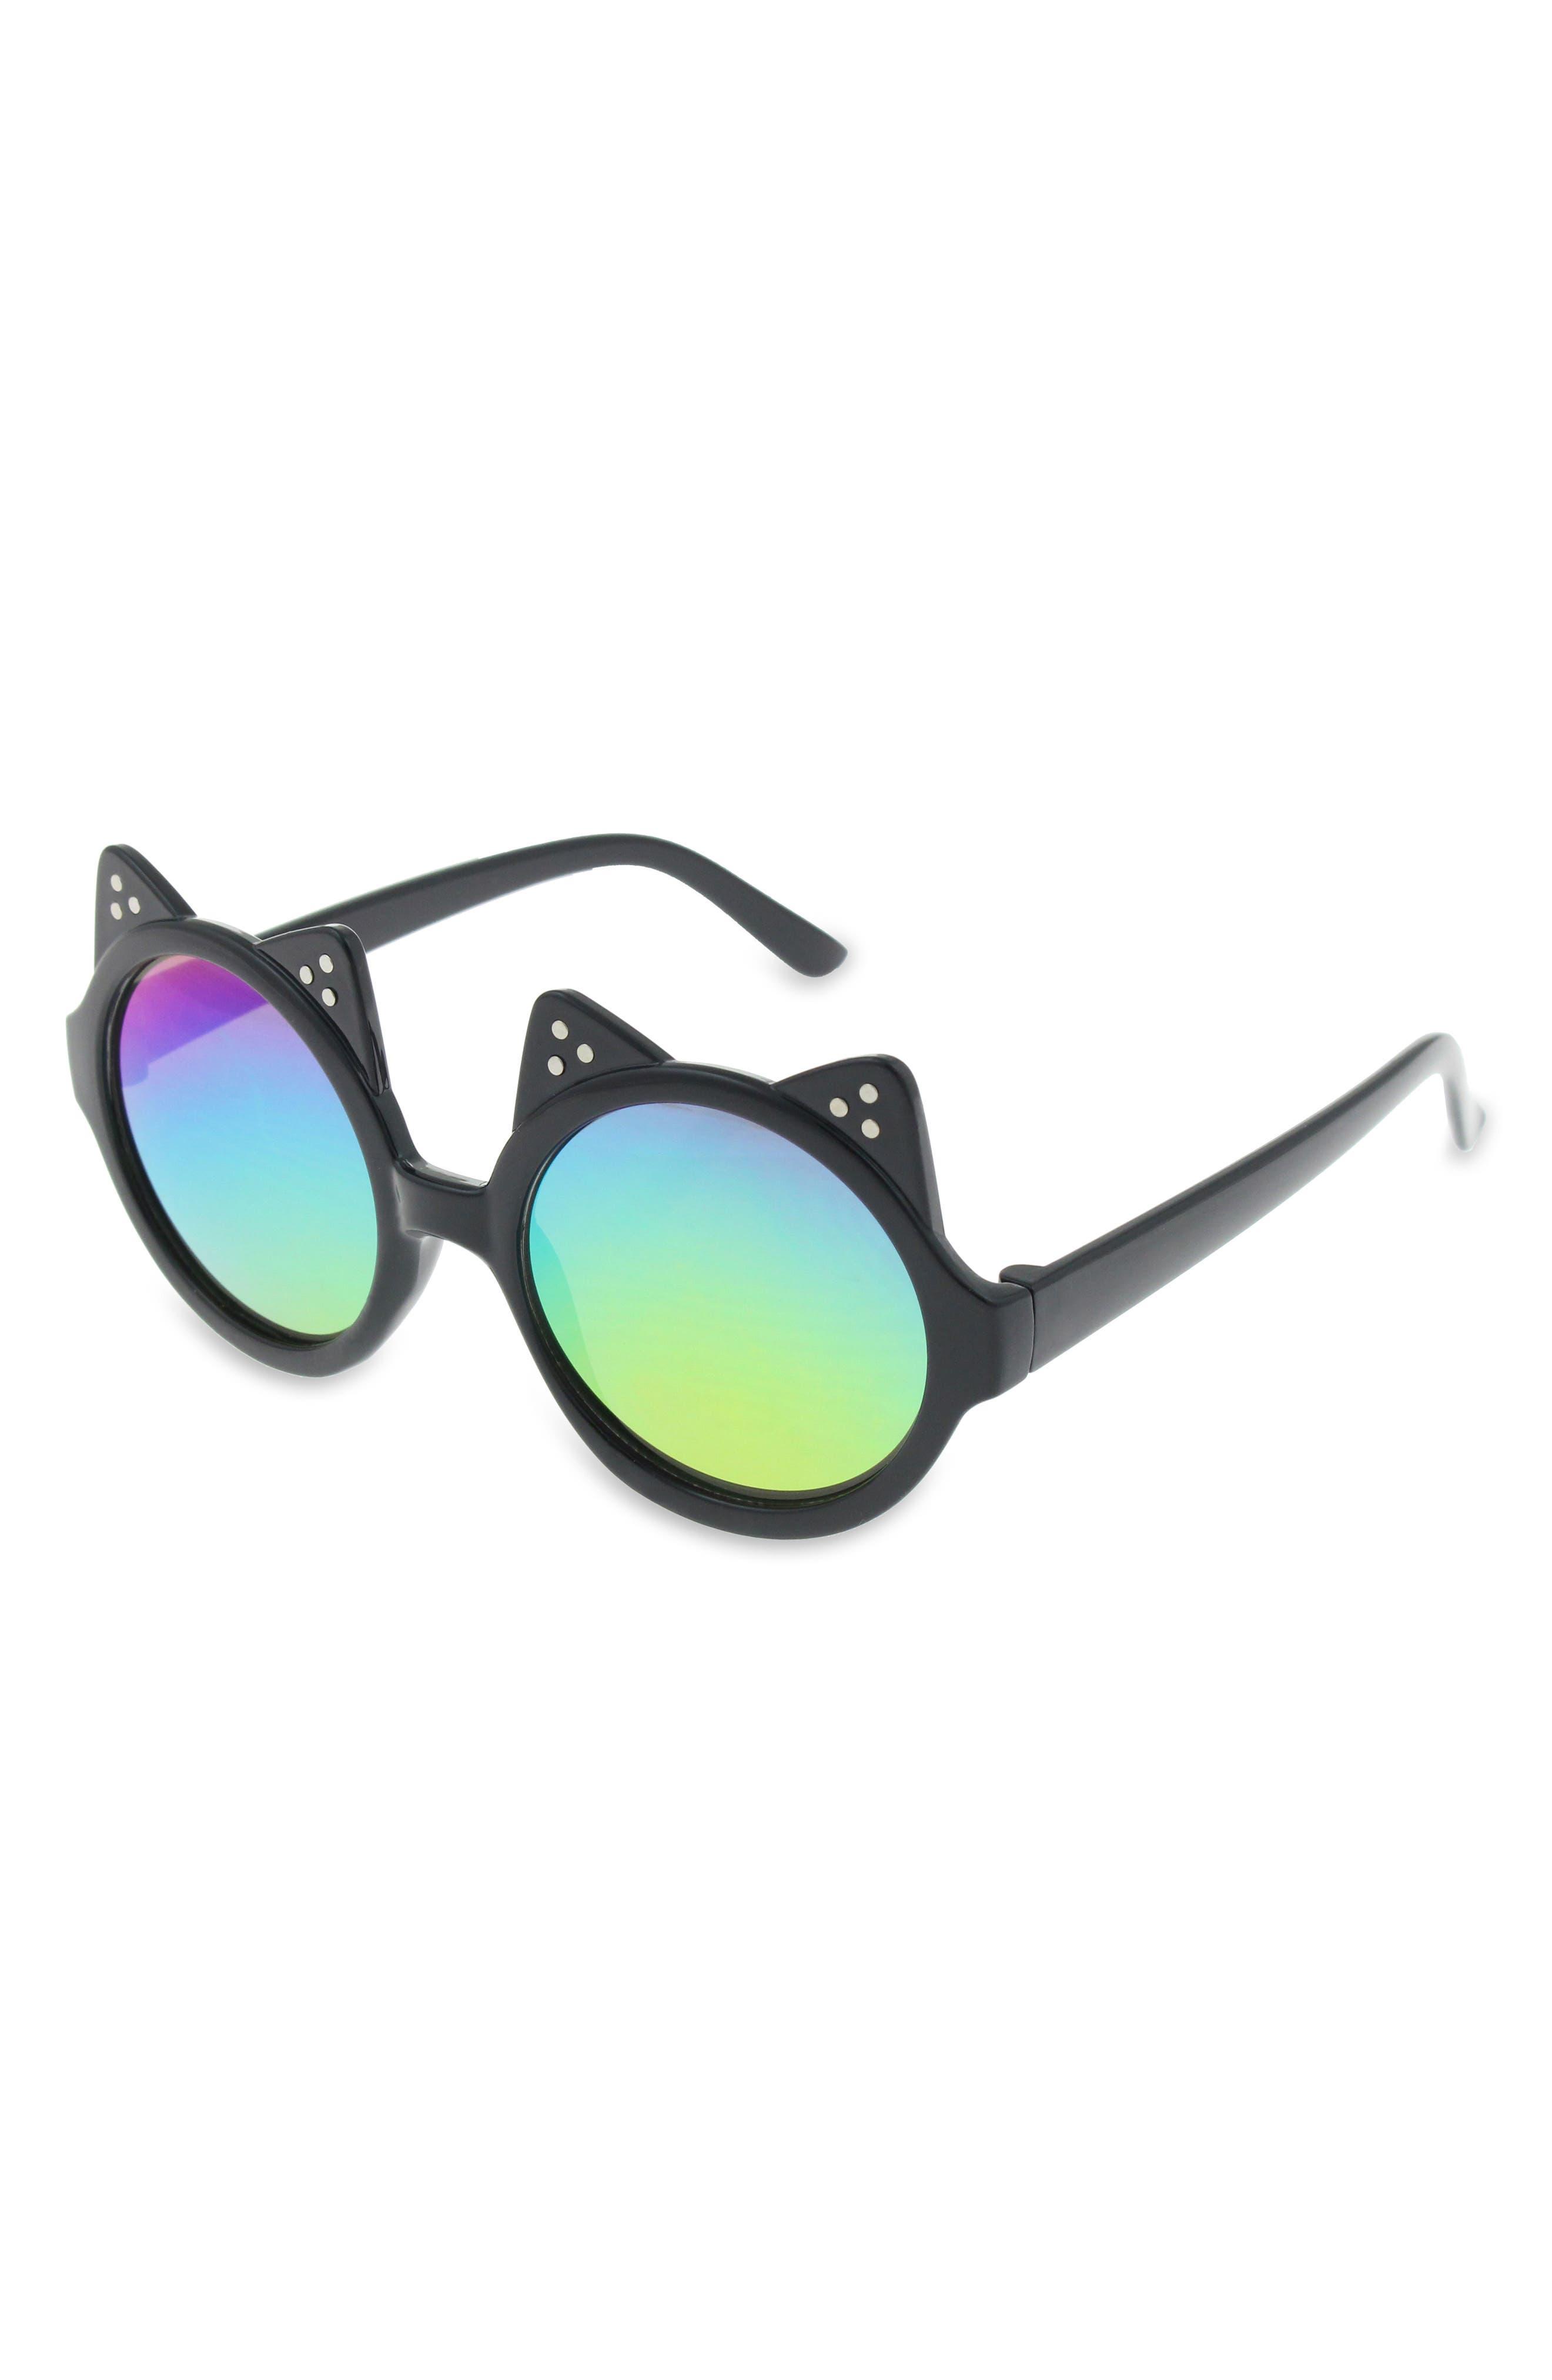 Double Cat Ear Sunglasses,                             Main thumbnail 1, color,                             001